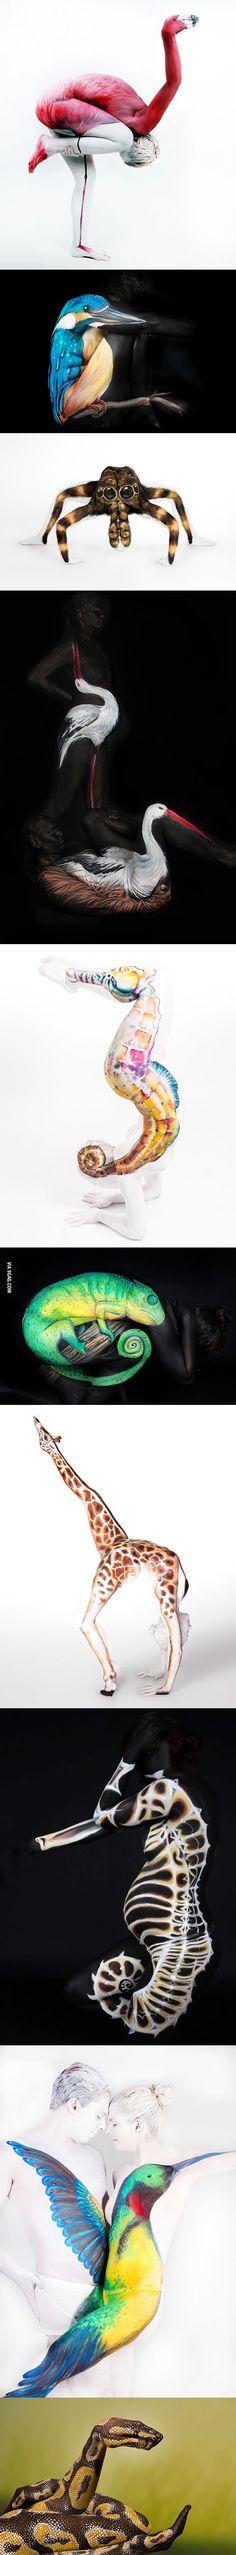 Animal Body Art